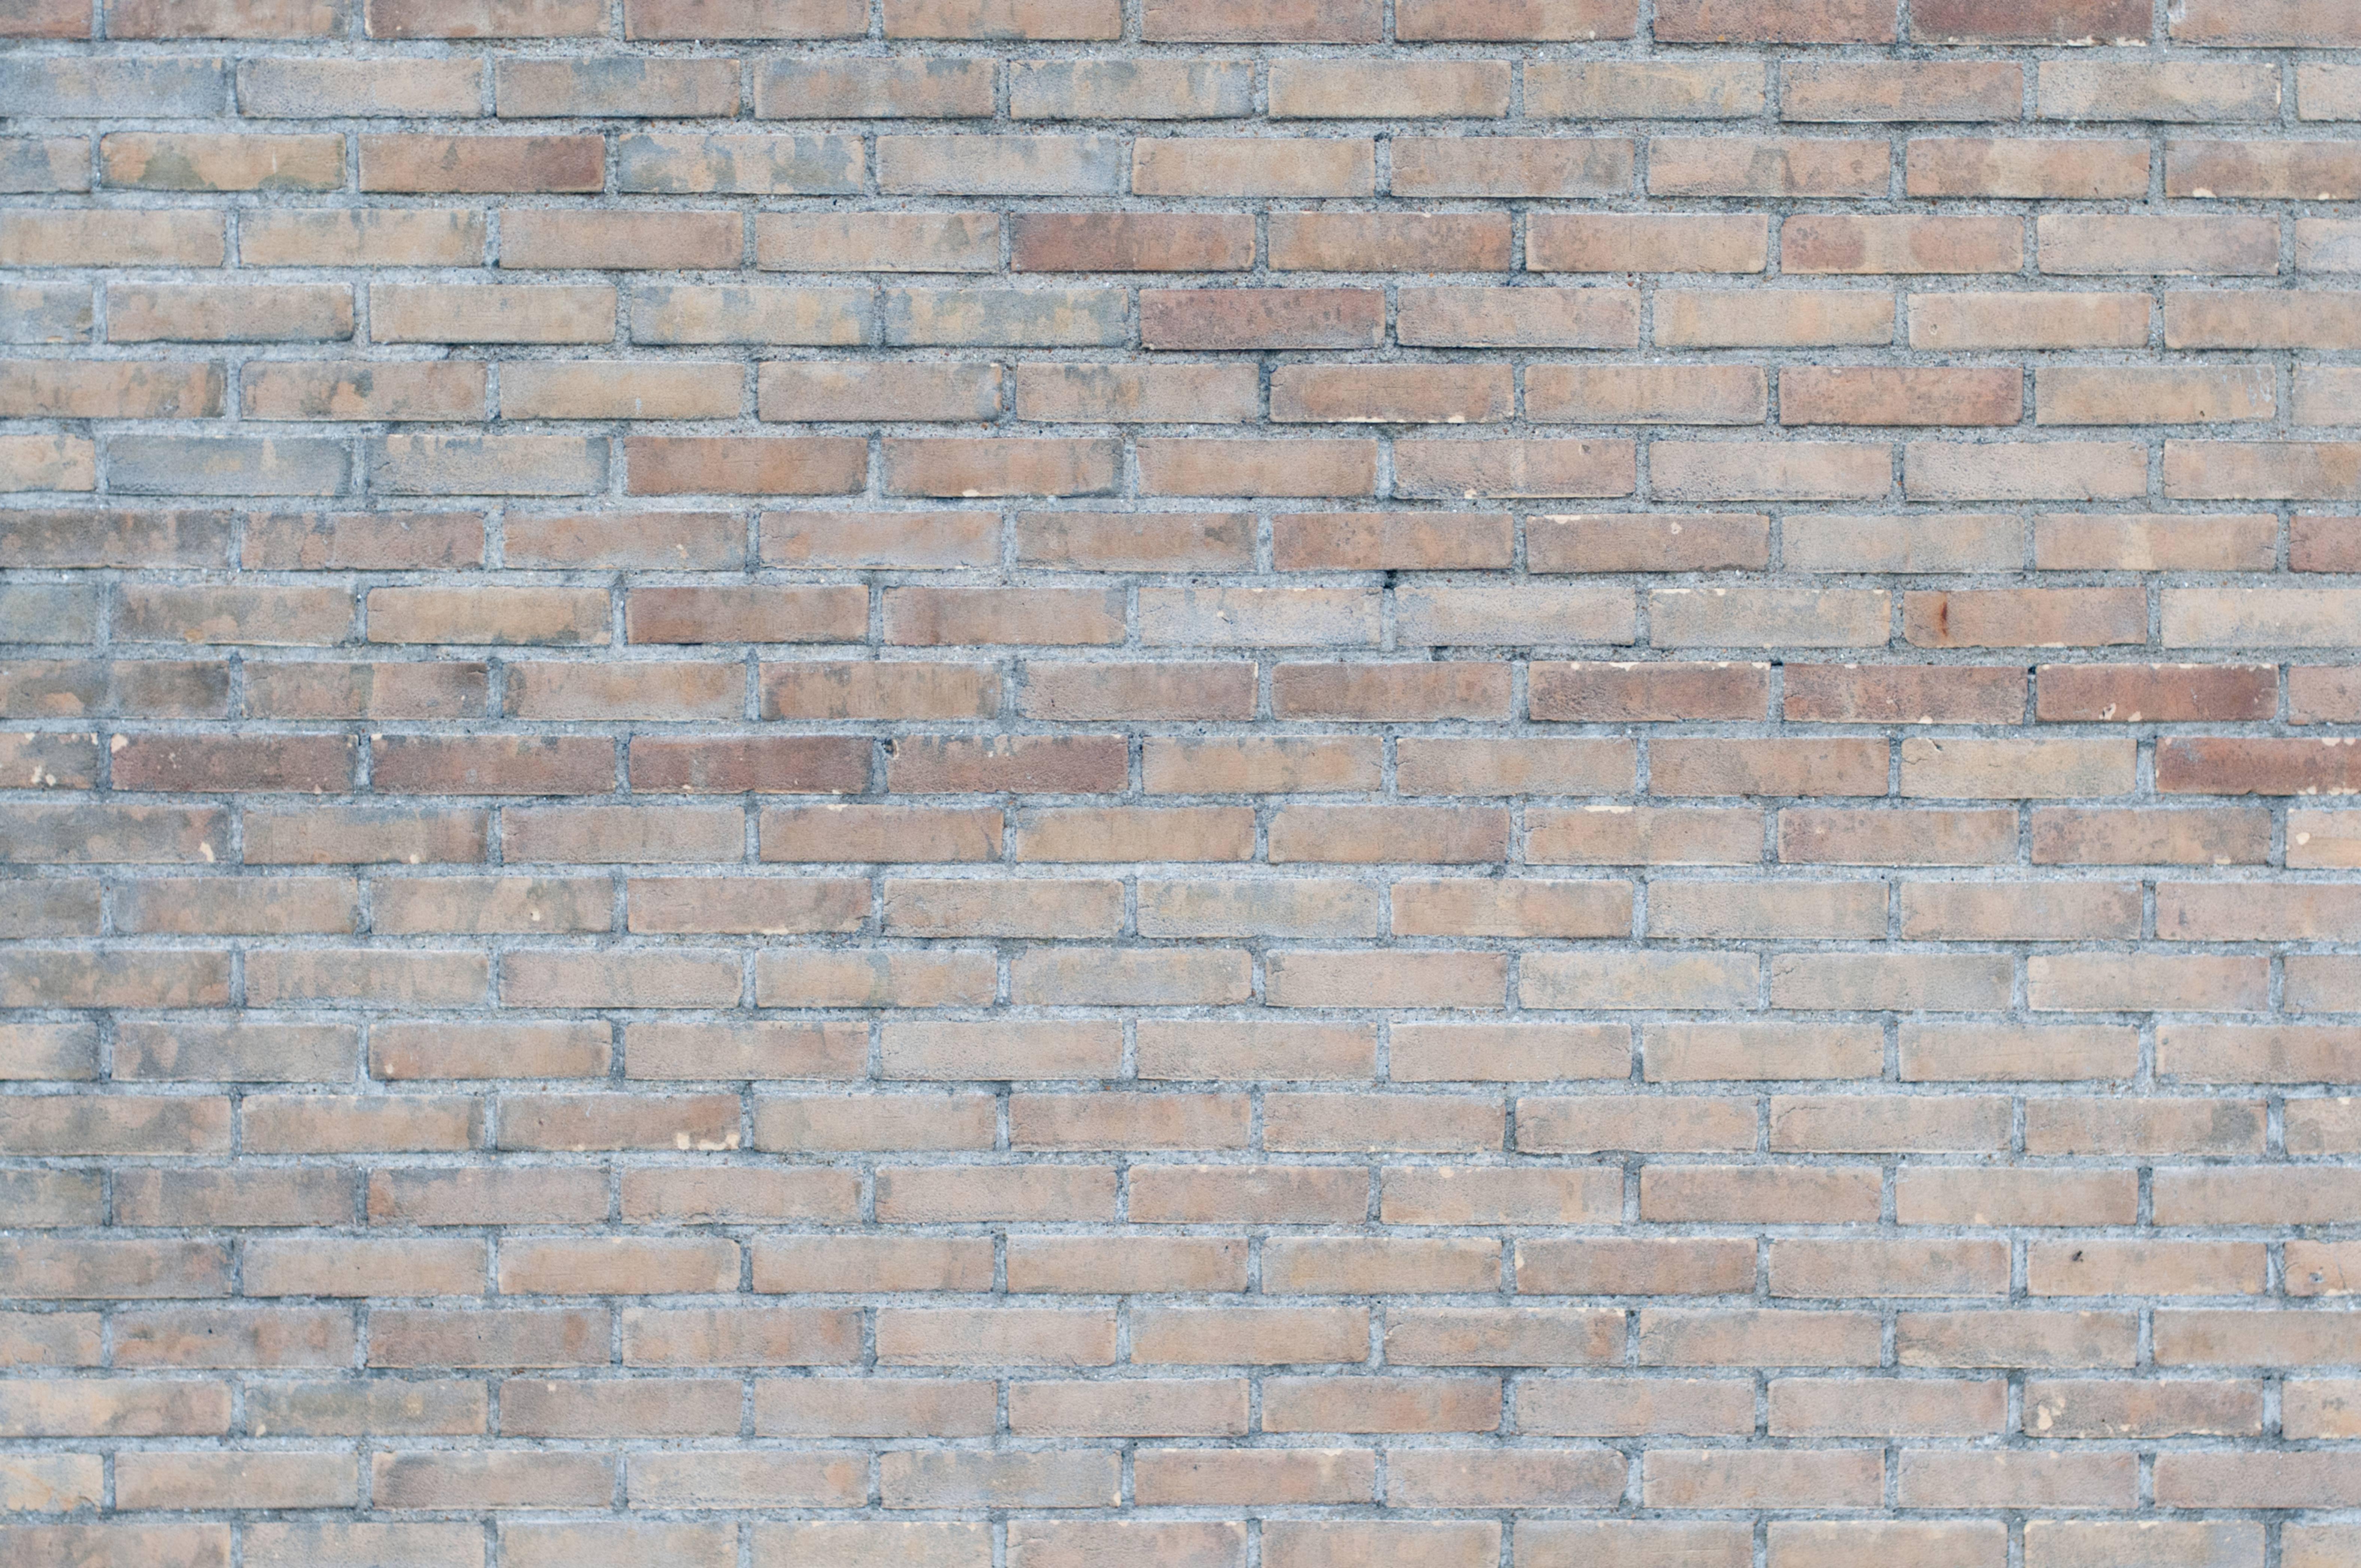 Brick house wall background